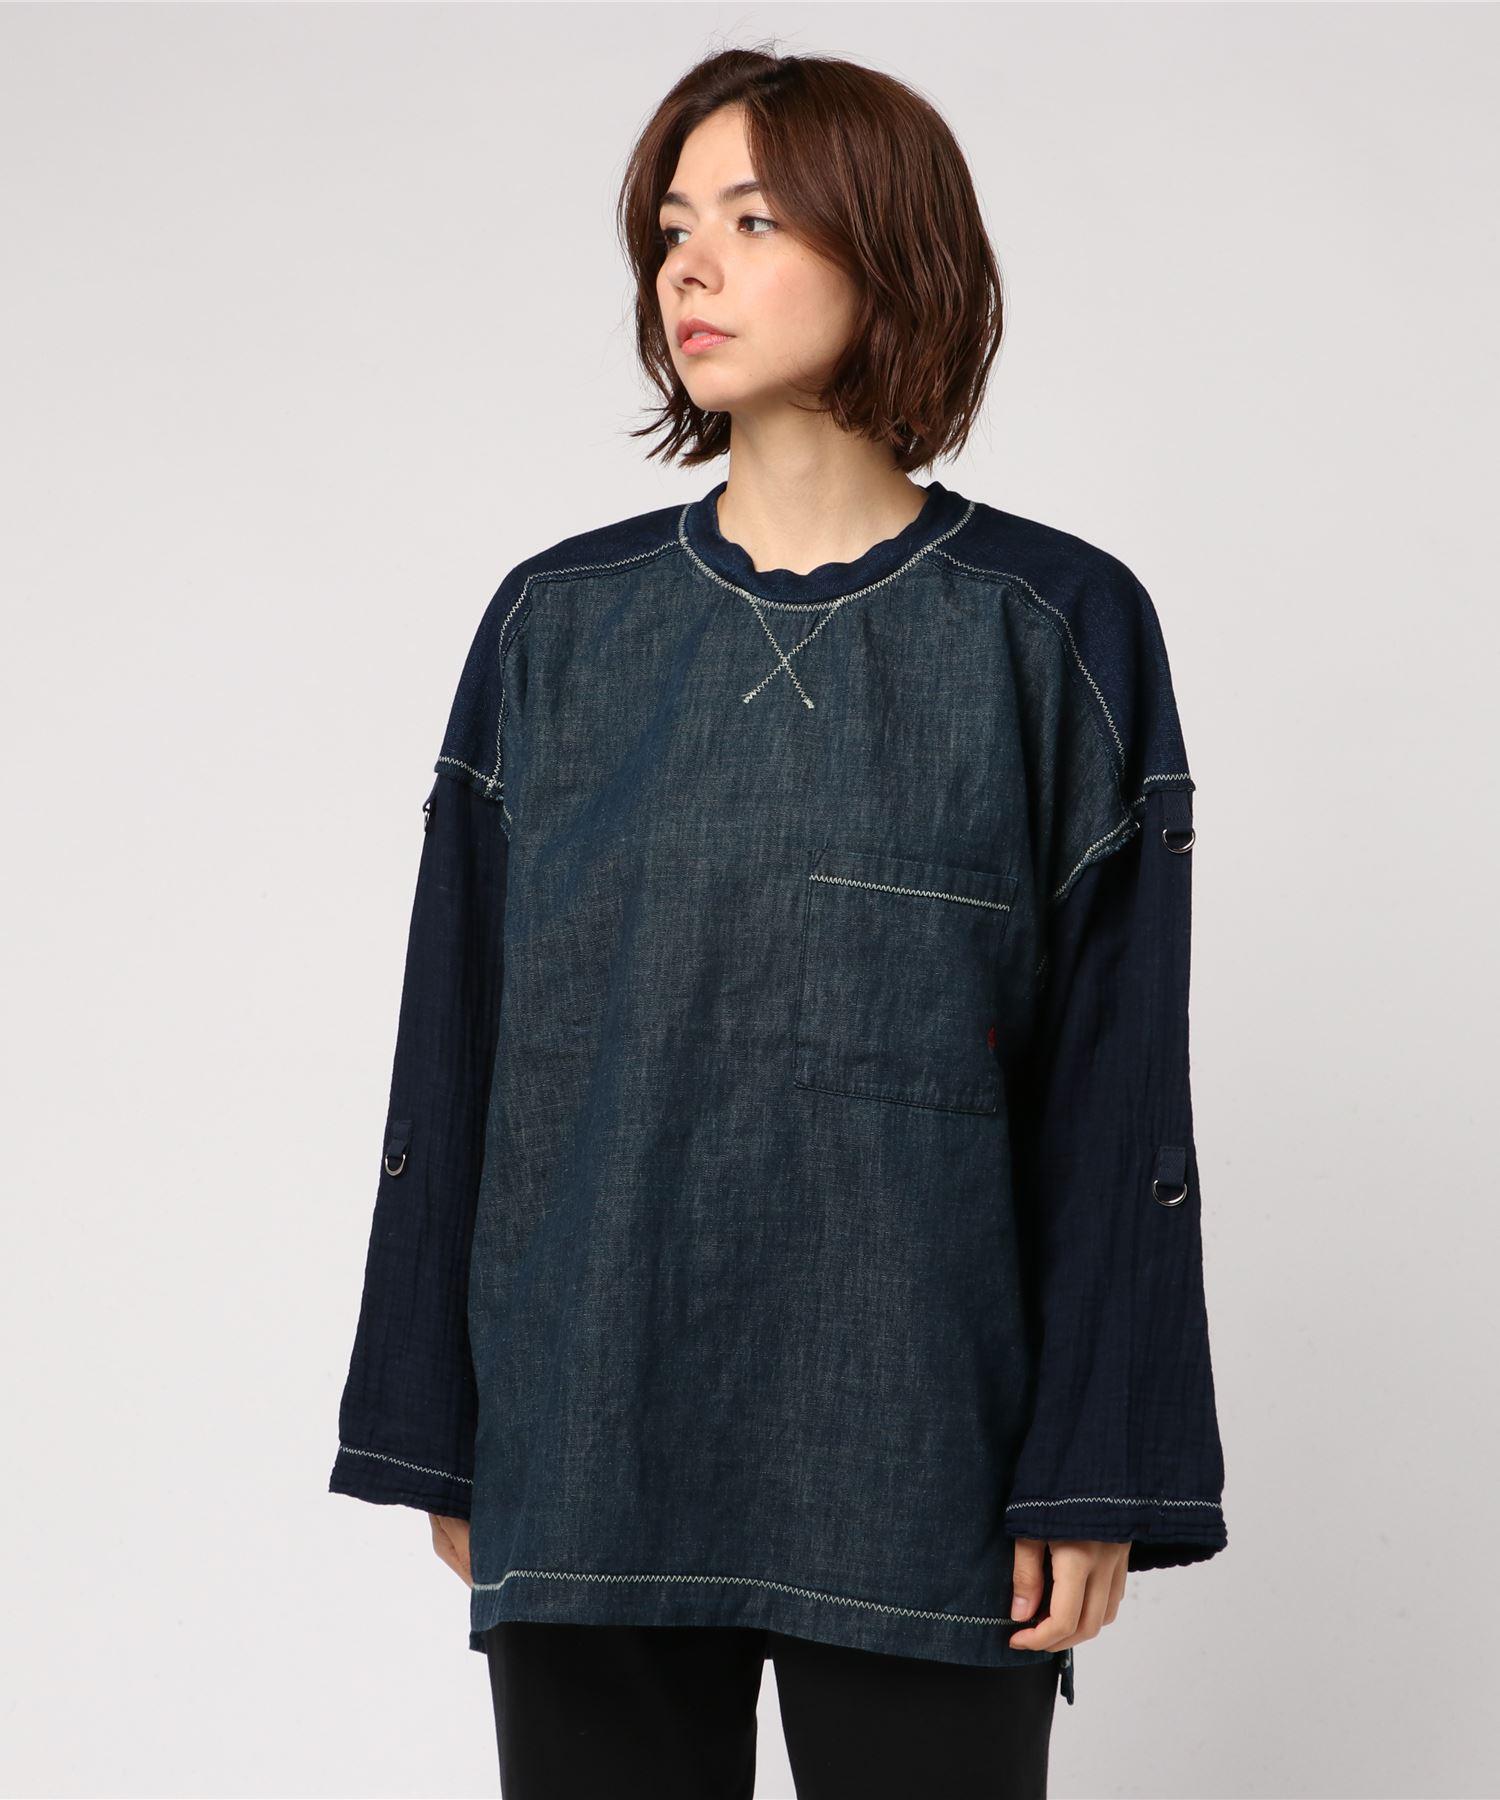 DEVIL刺繍 デニムスクラッチ プルオーバーシャツ